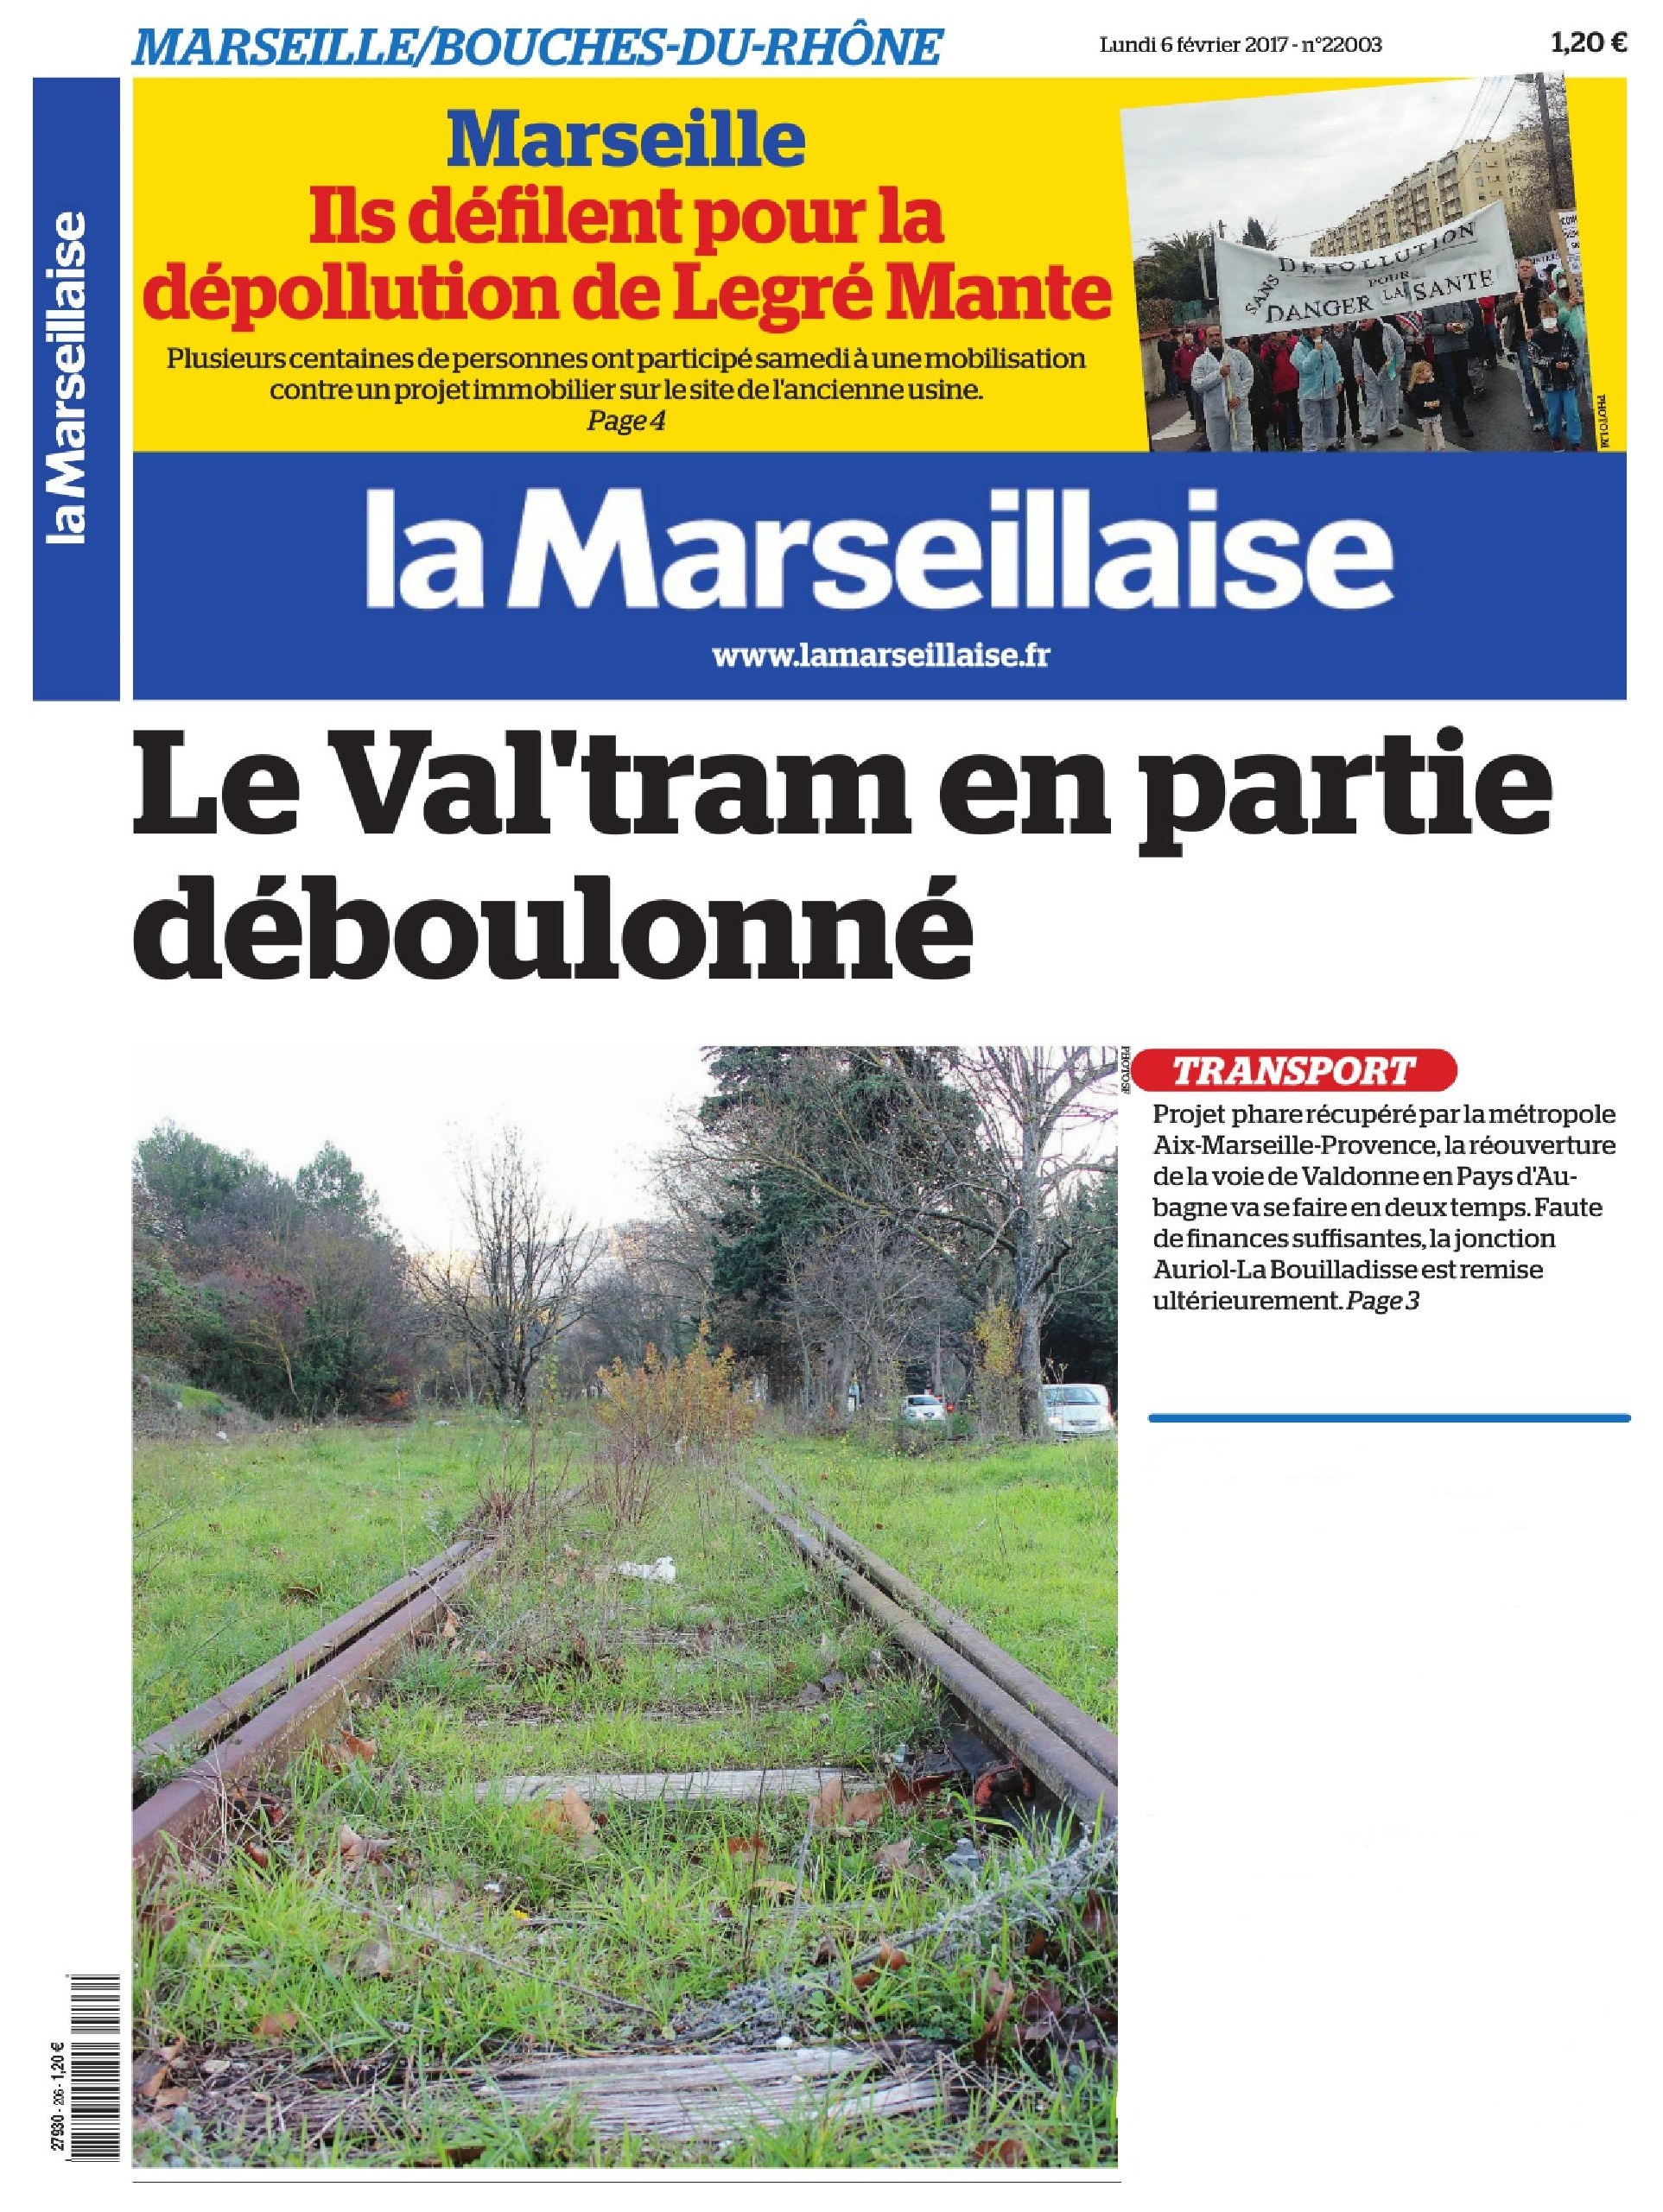 LaMarseillaise1